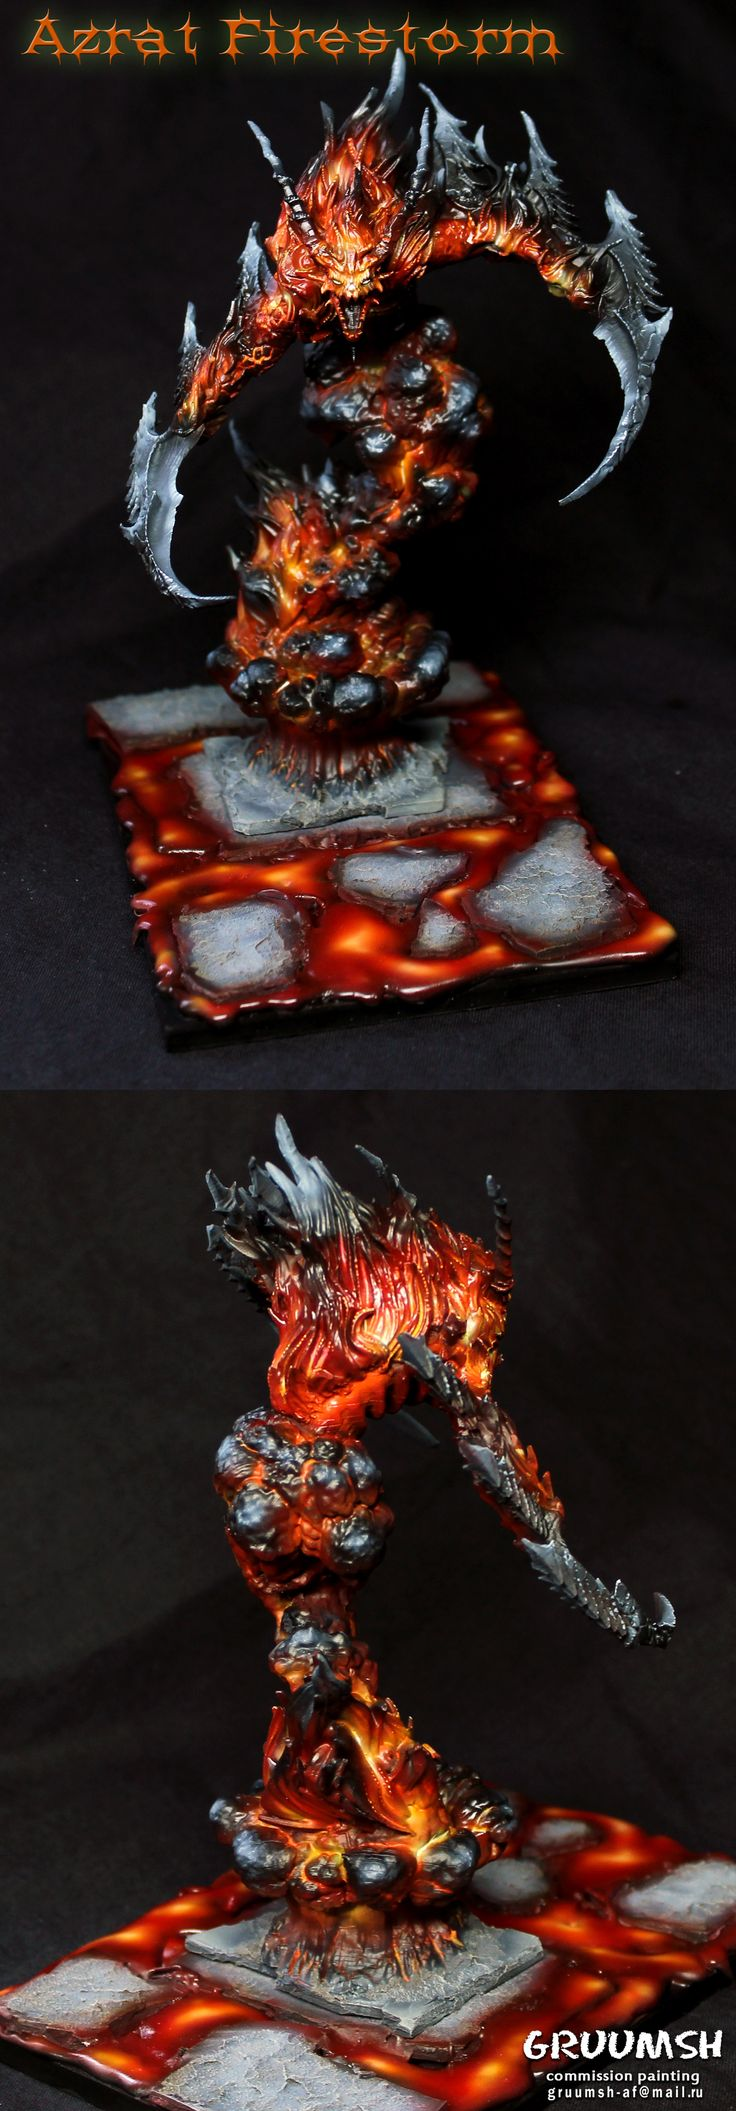 Azrat Firestorm